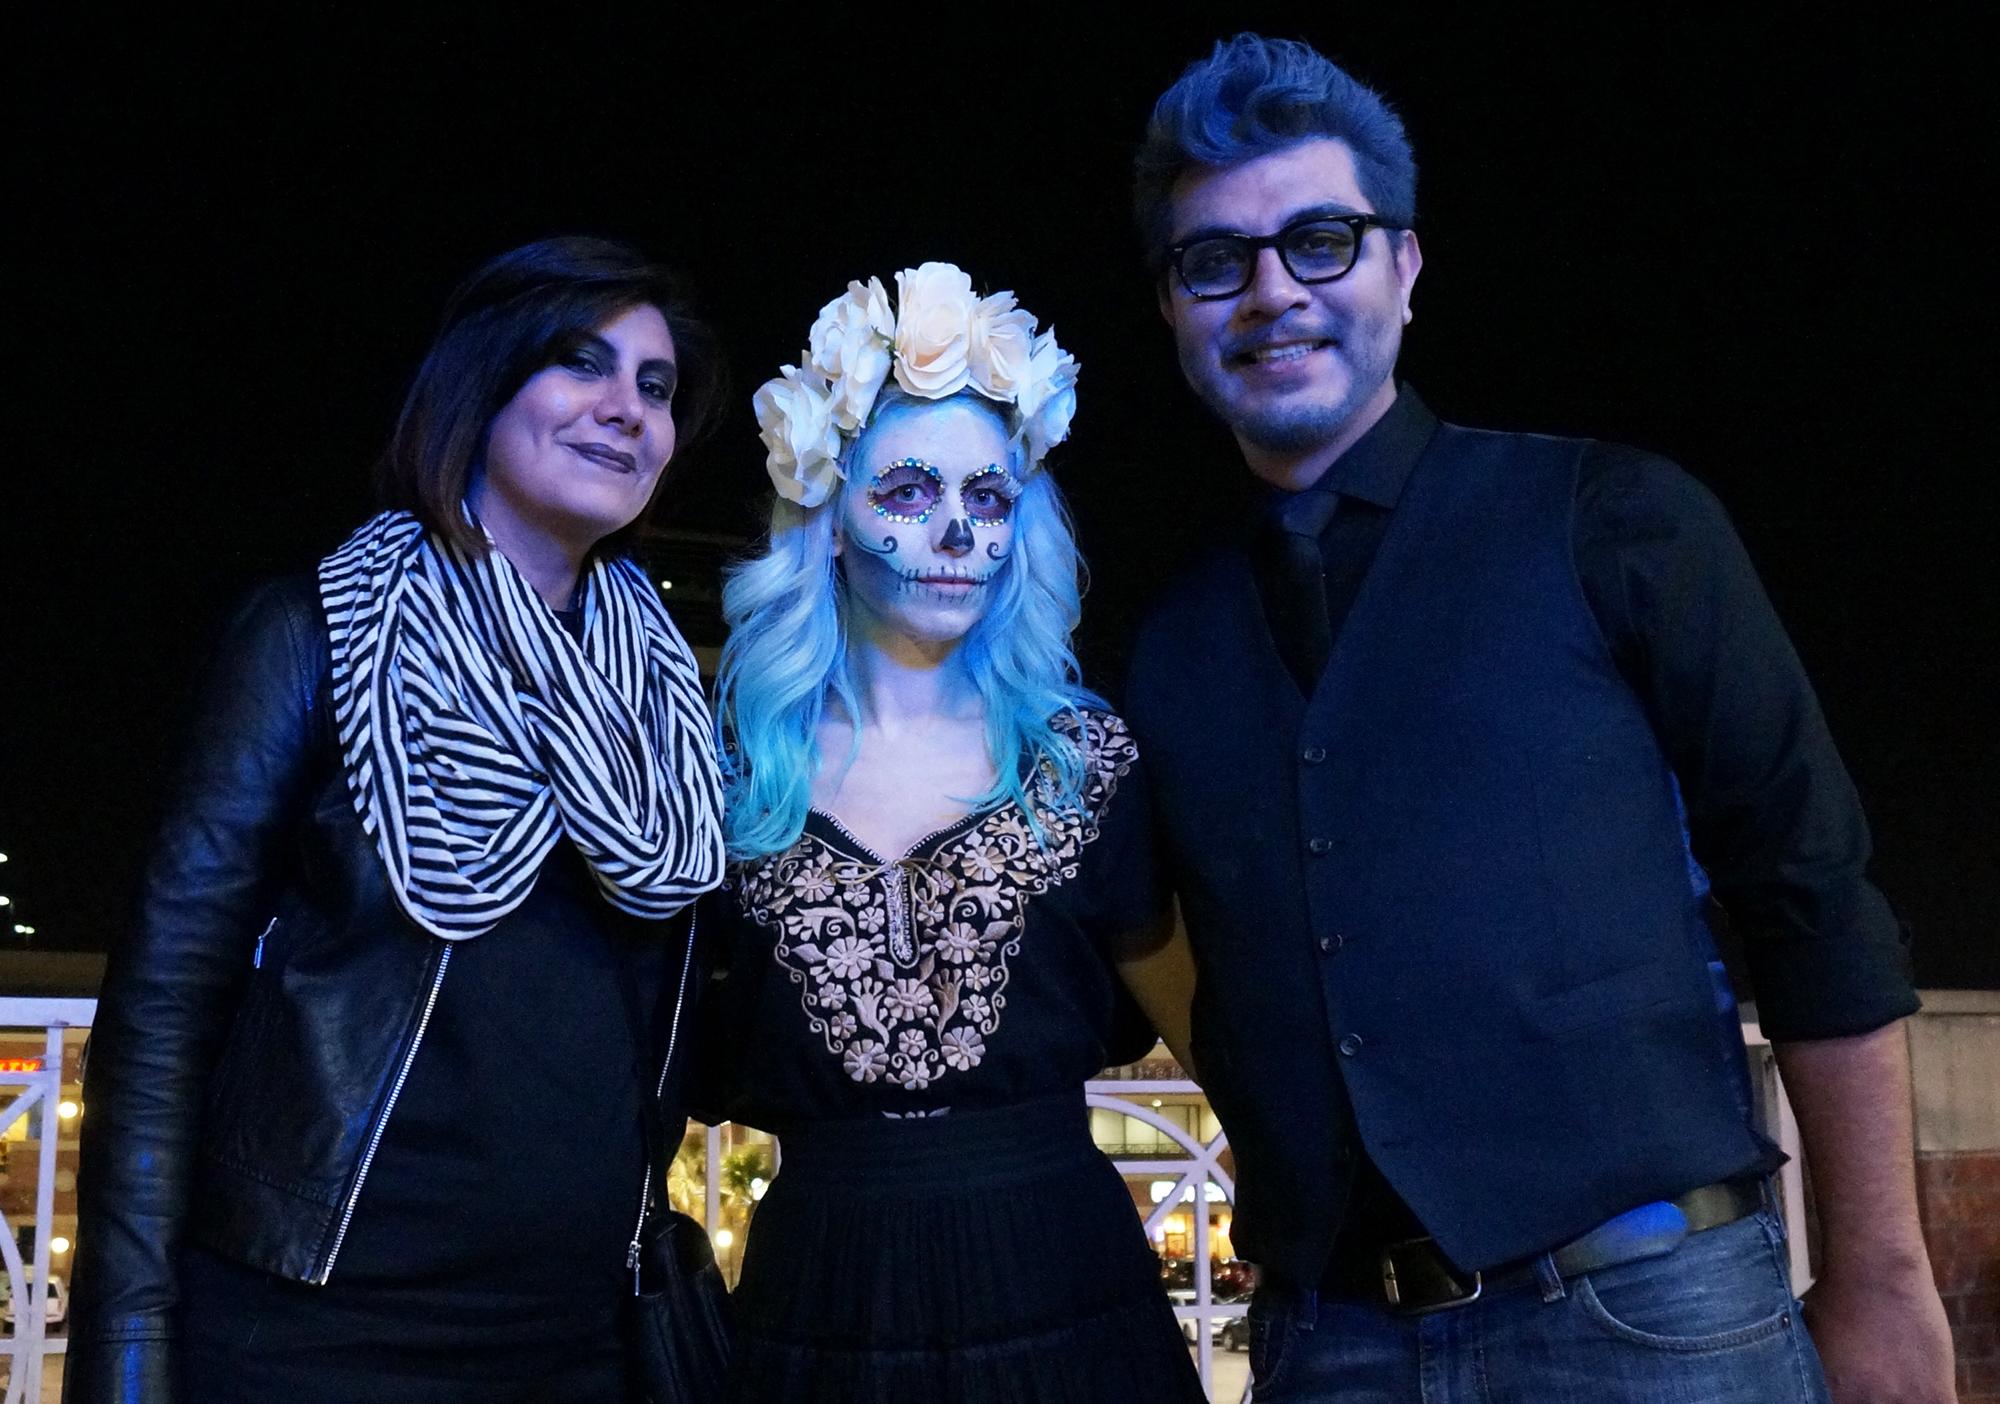 sugar skull halloween costume